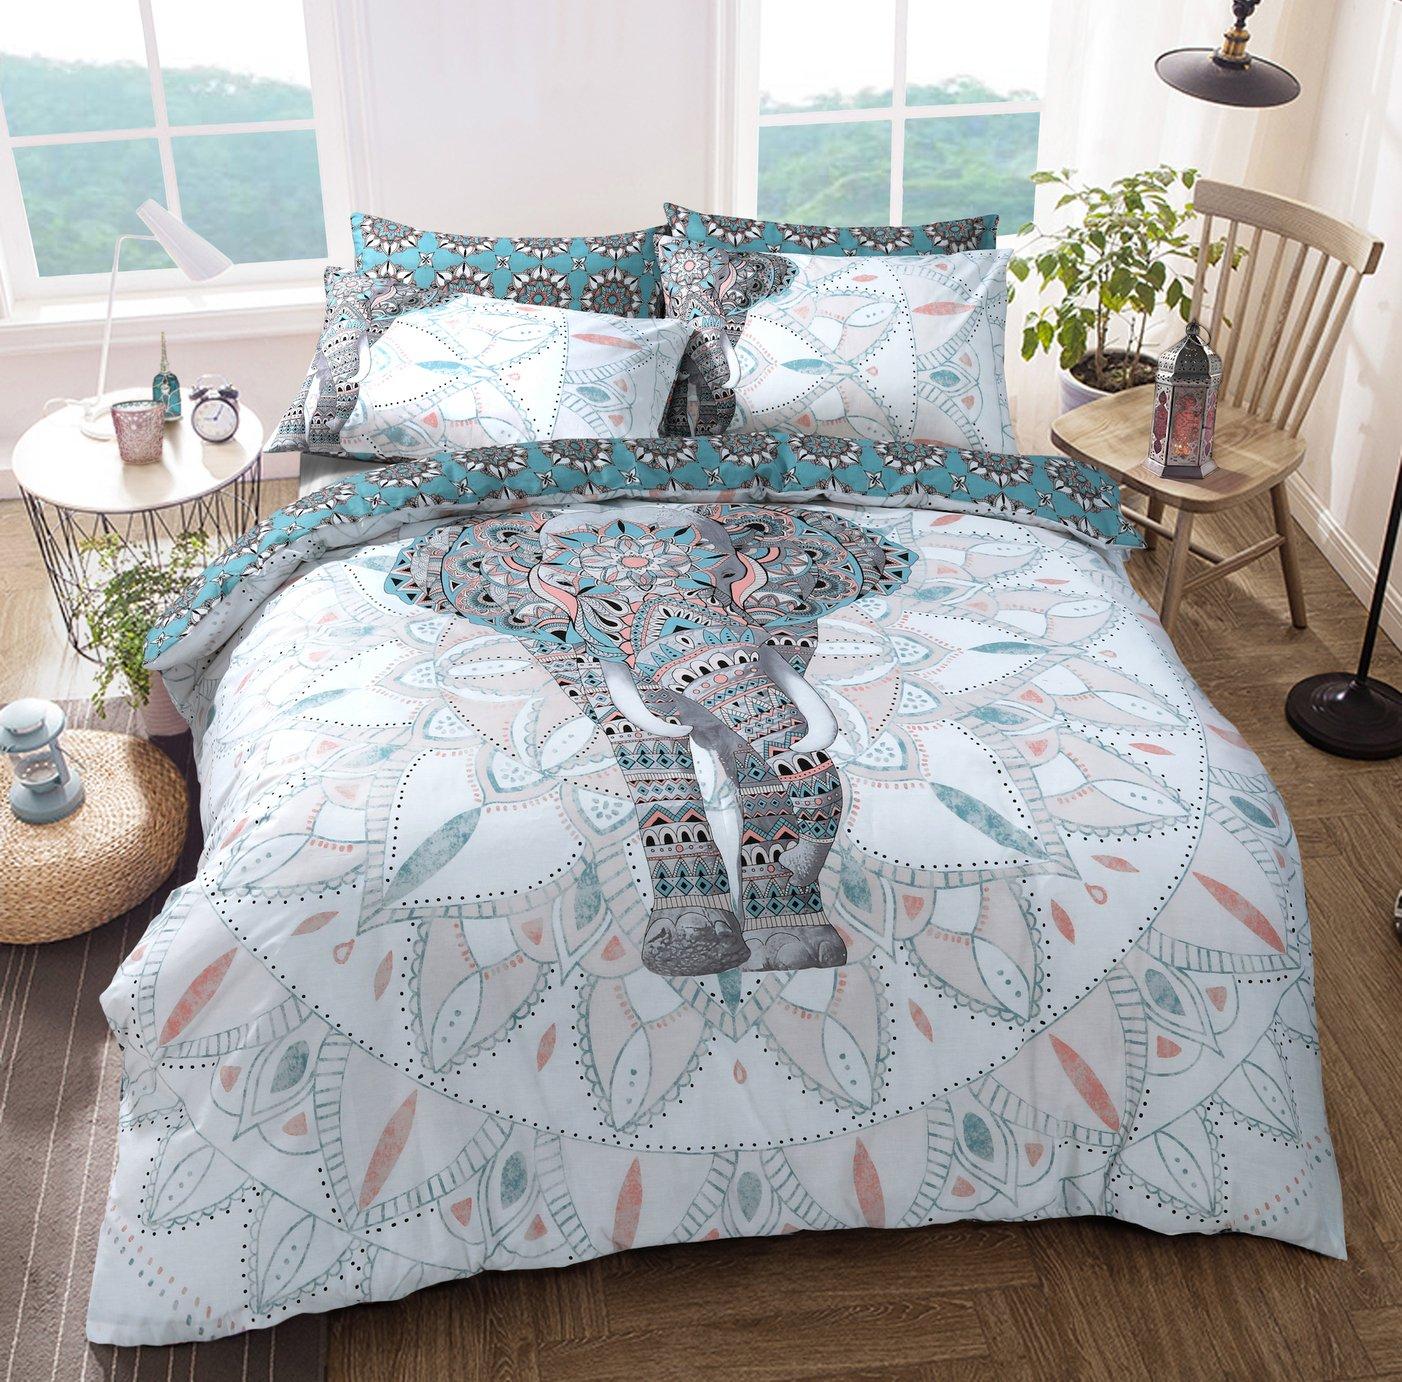 Argos Home Elephant Mandala Bedding Set - Double